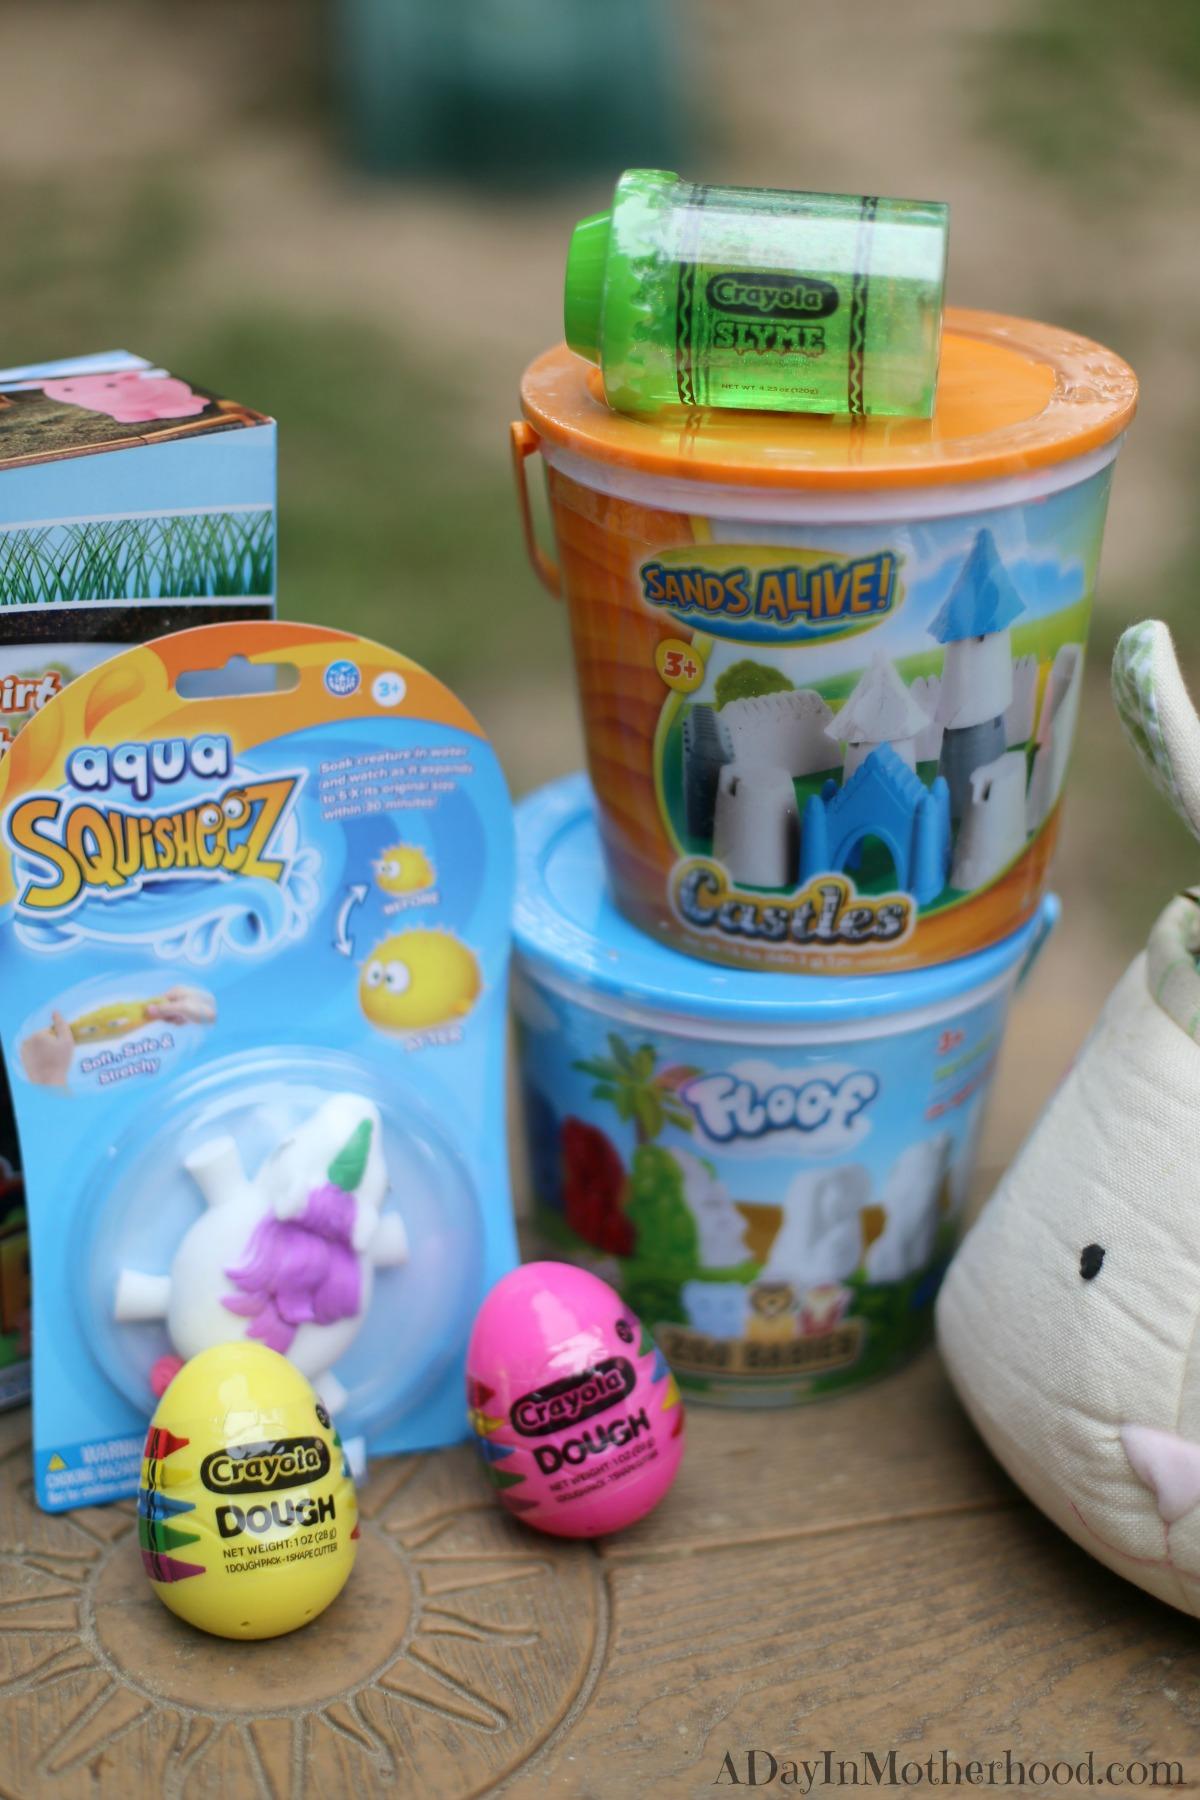 Crayola Makes Stuffing Easter Baskets Full of Fun Floop